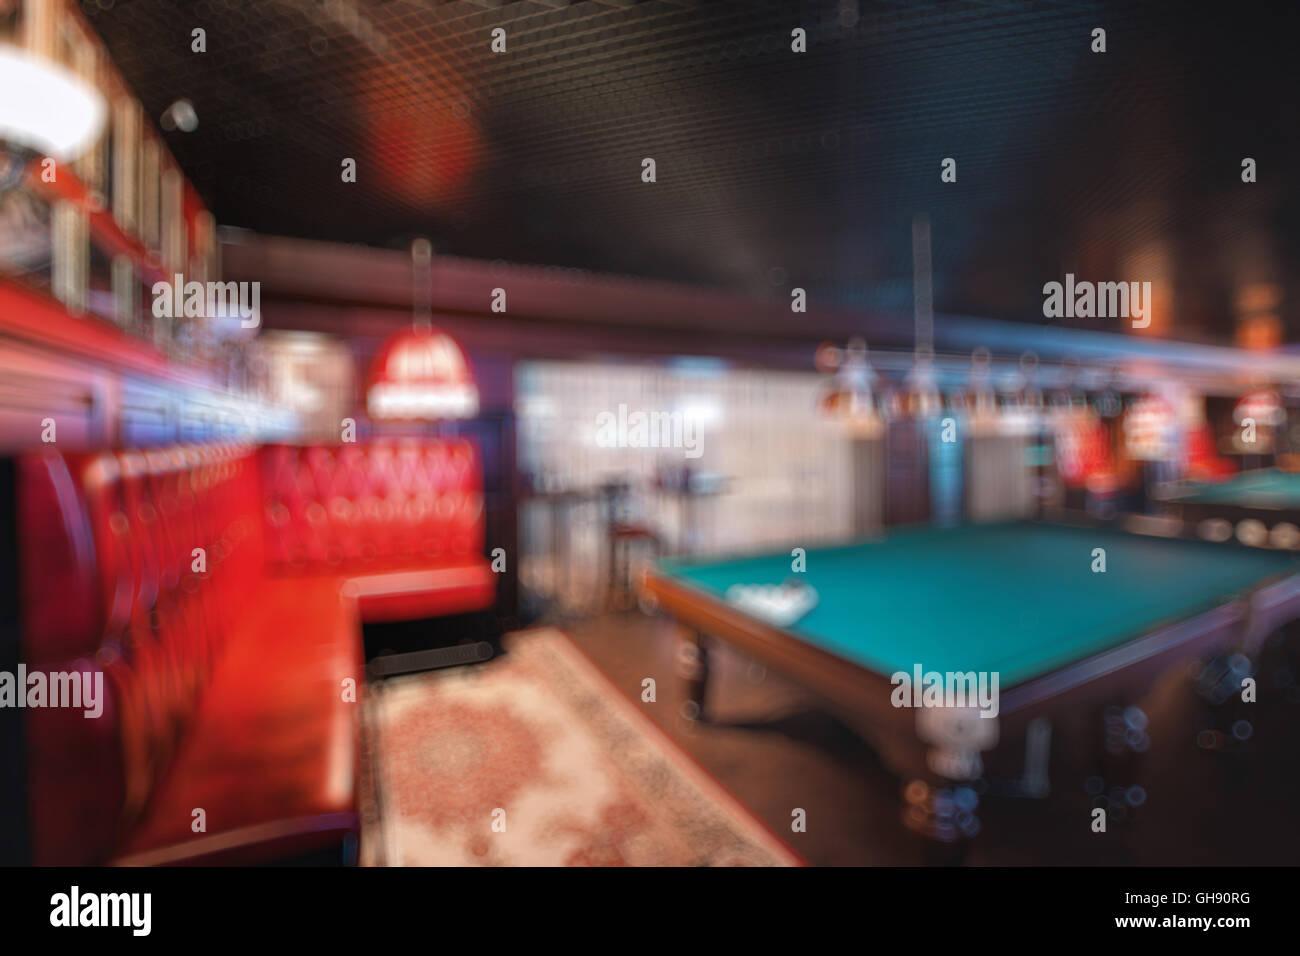 Night Club Interior Stockfotos & Night Club Interior Bilder - Alamy